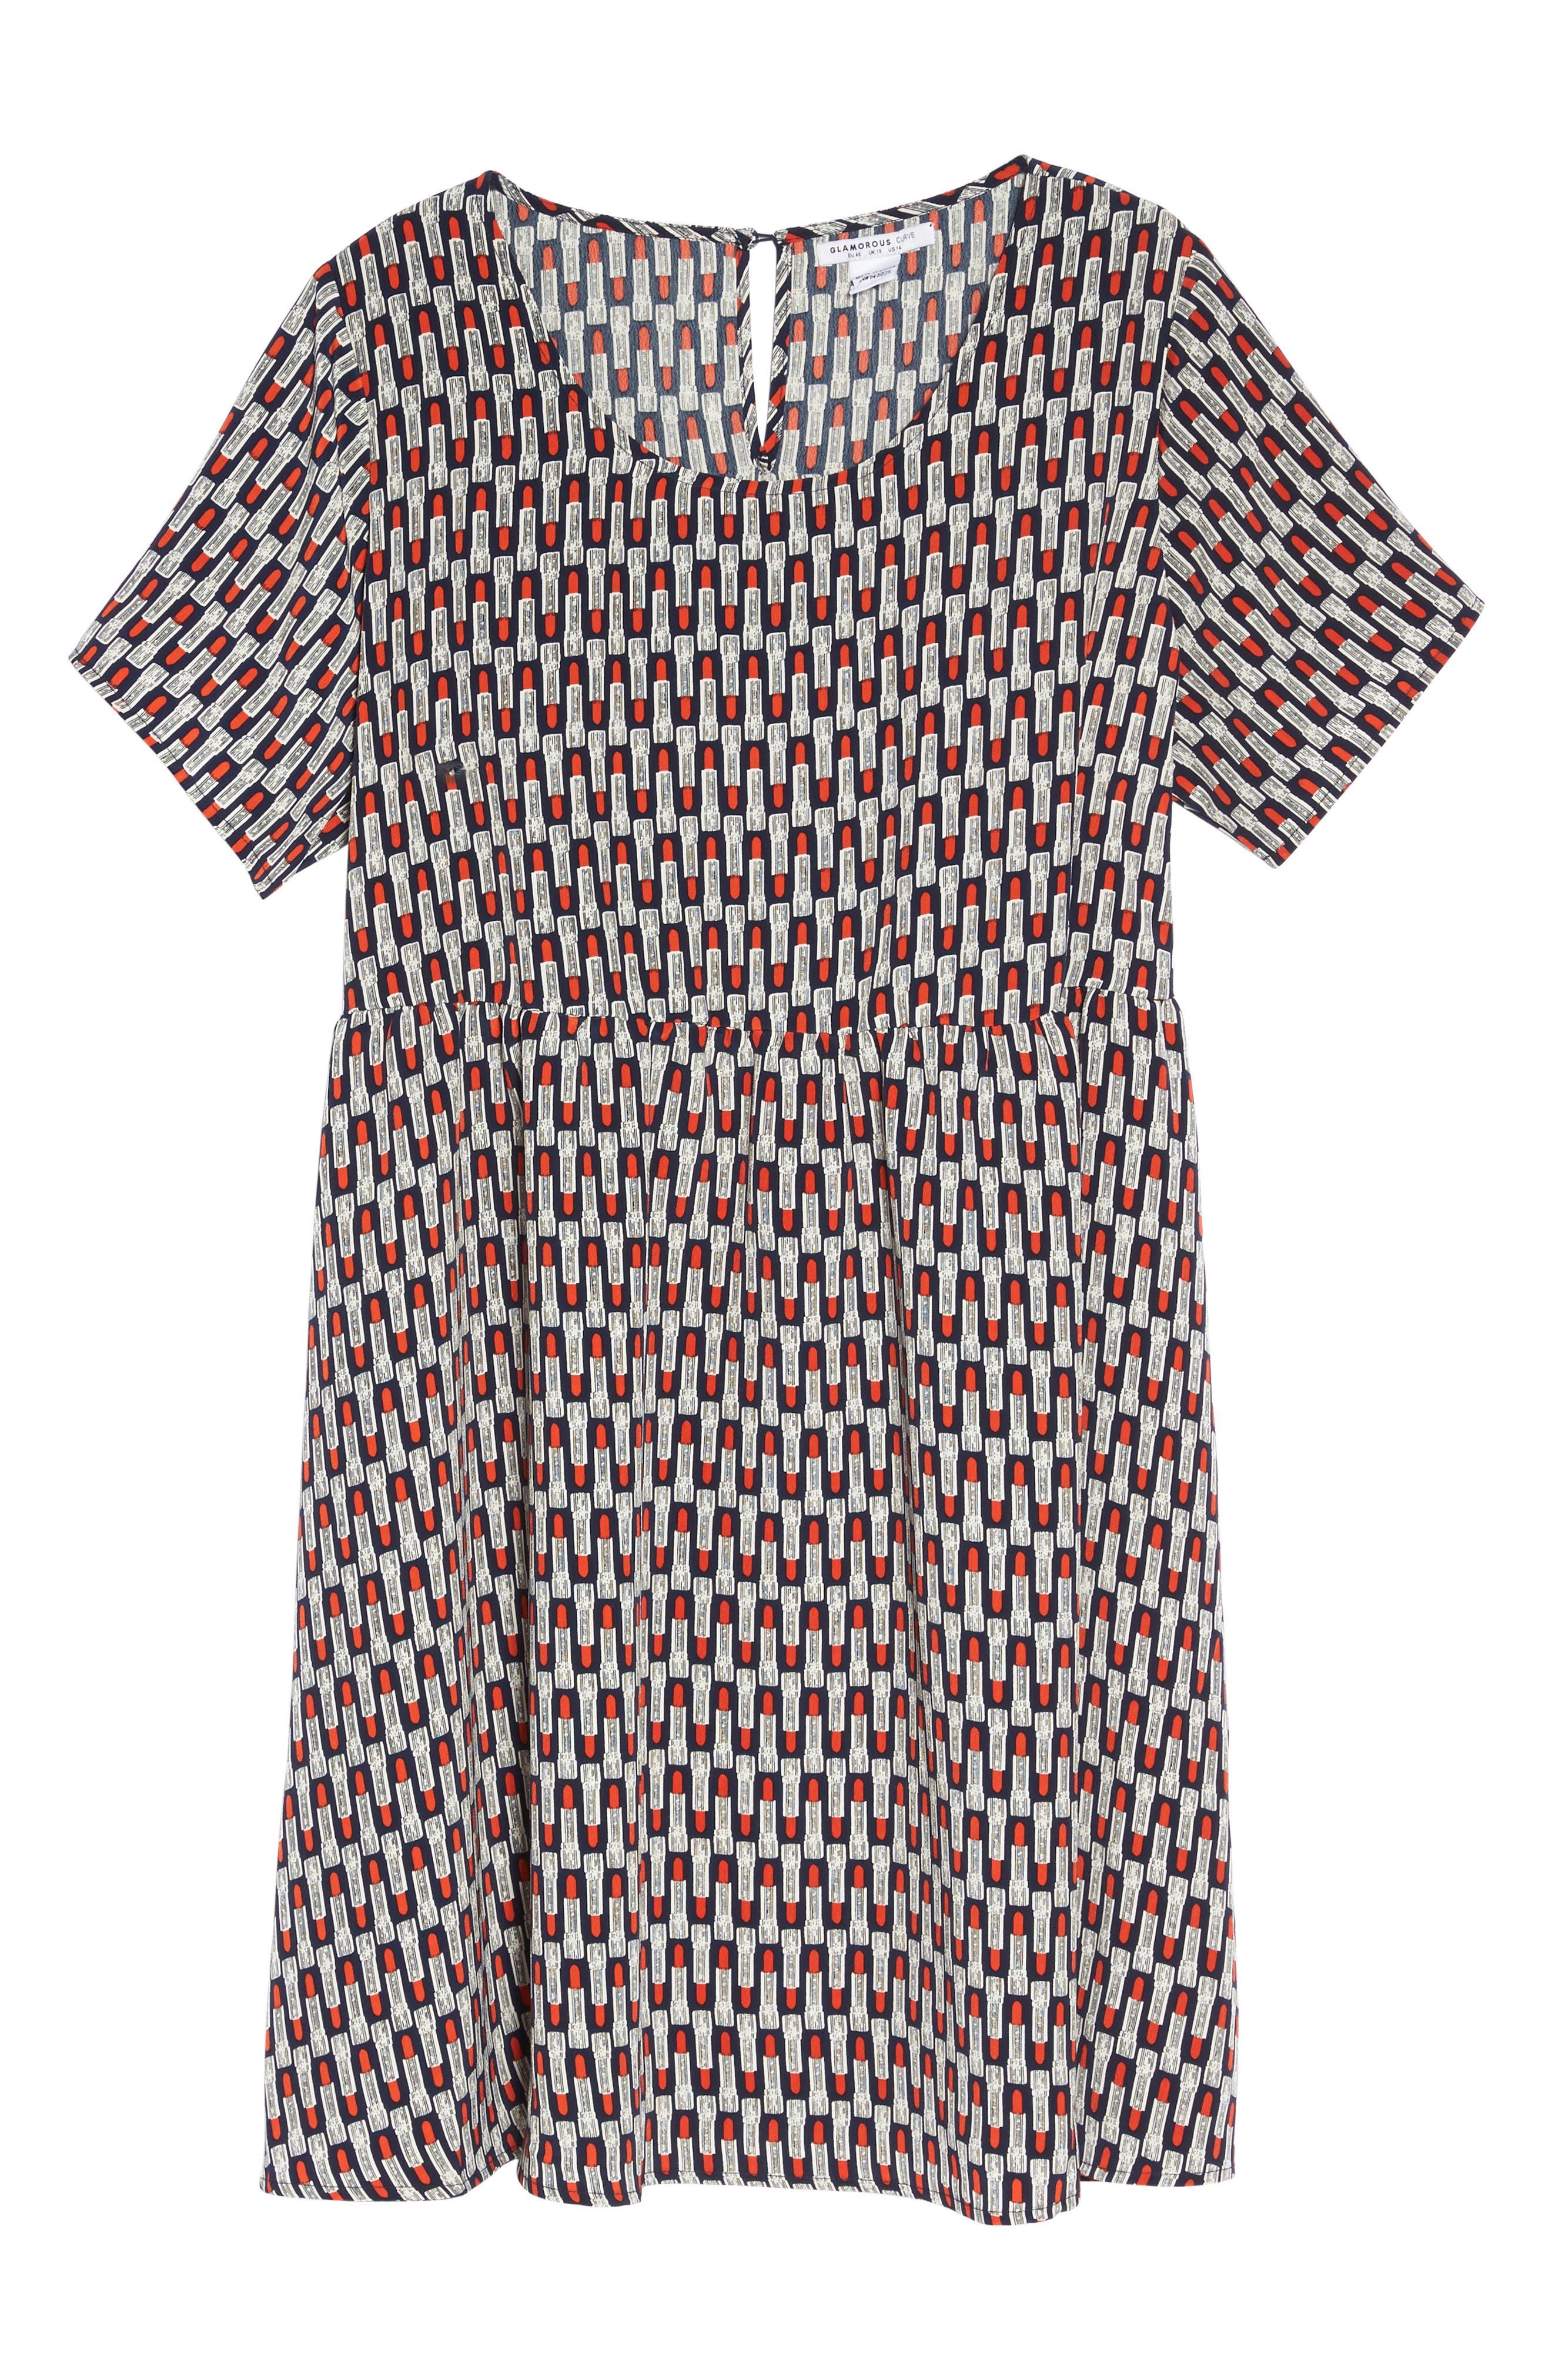 Lipstick Print Fit & Flare Dress,                             Alternate thumbnail 6, color,                             Navy Lipstick